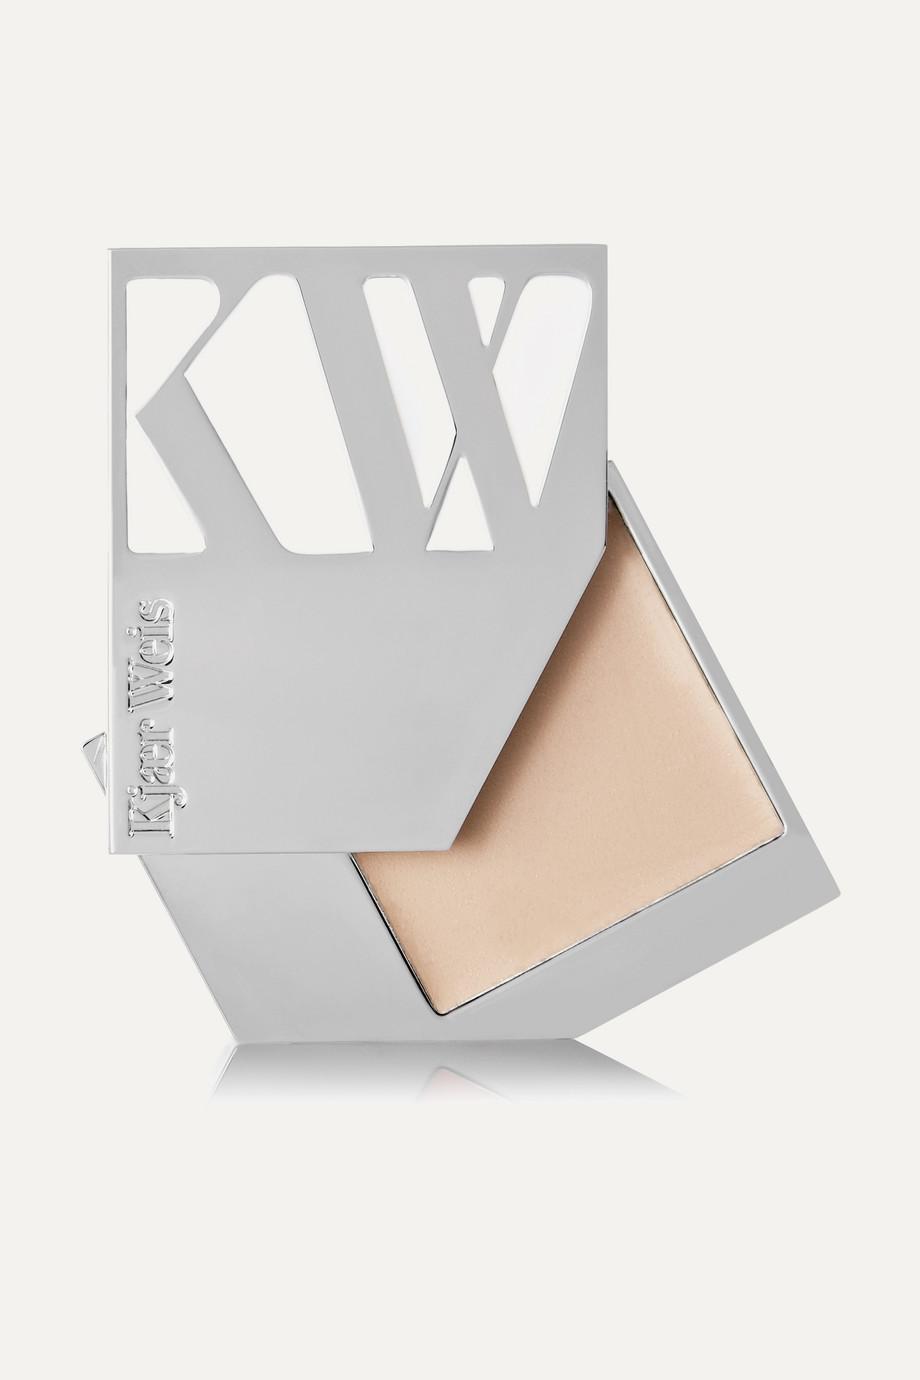 Kjaer Weis Highlighter - Ravishing